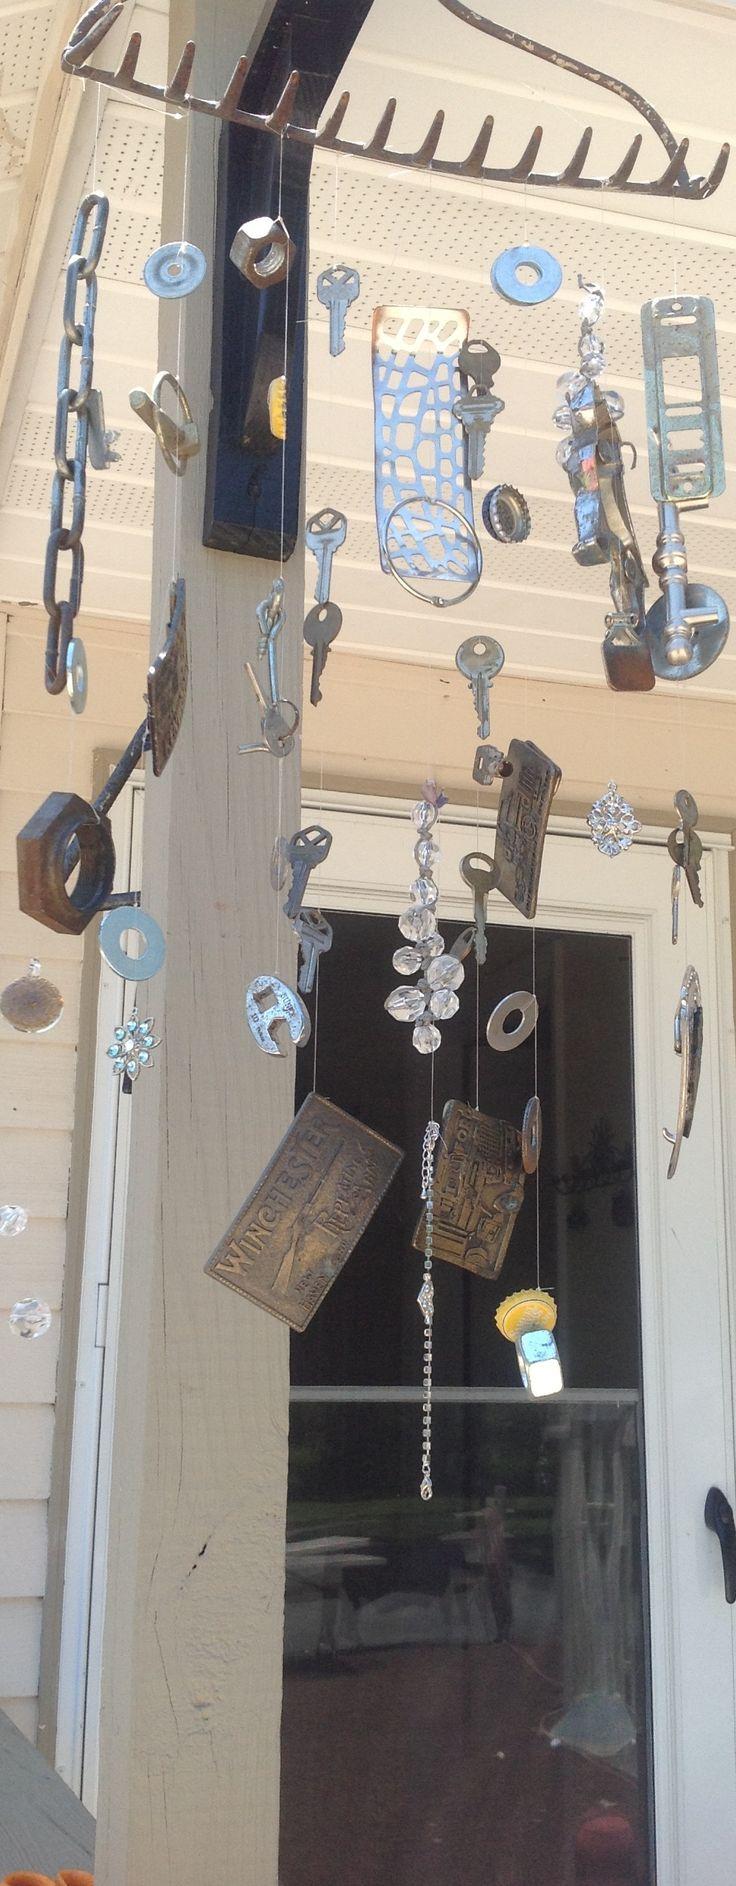 Metal windchimes.  DIY. Homemade.  Junk in the garage.  Sounds great